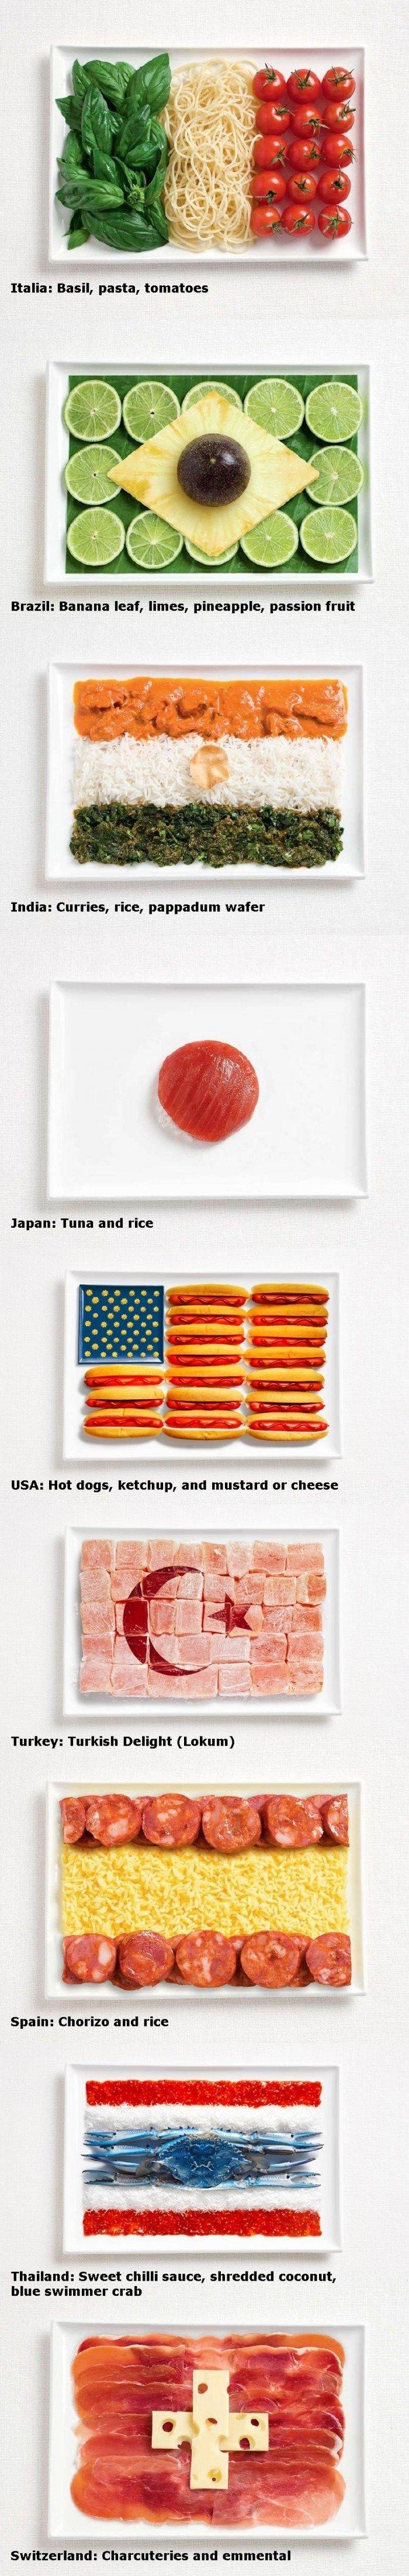 food flags comp. . Ital ' Basil, pasta, tomatoes Bra Banana leaf, India: Curries, rice, poppadom wafer Japan: Tuna and r e Spain: Chor and r e Thailin wed chill